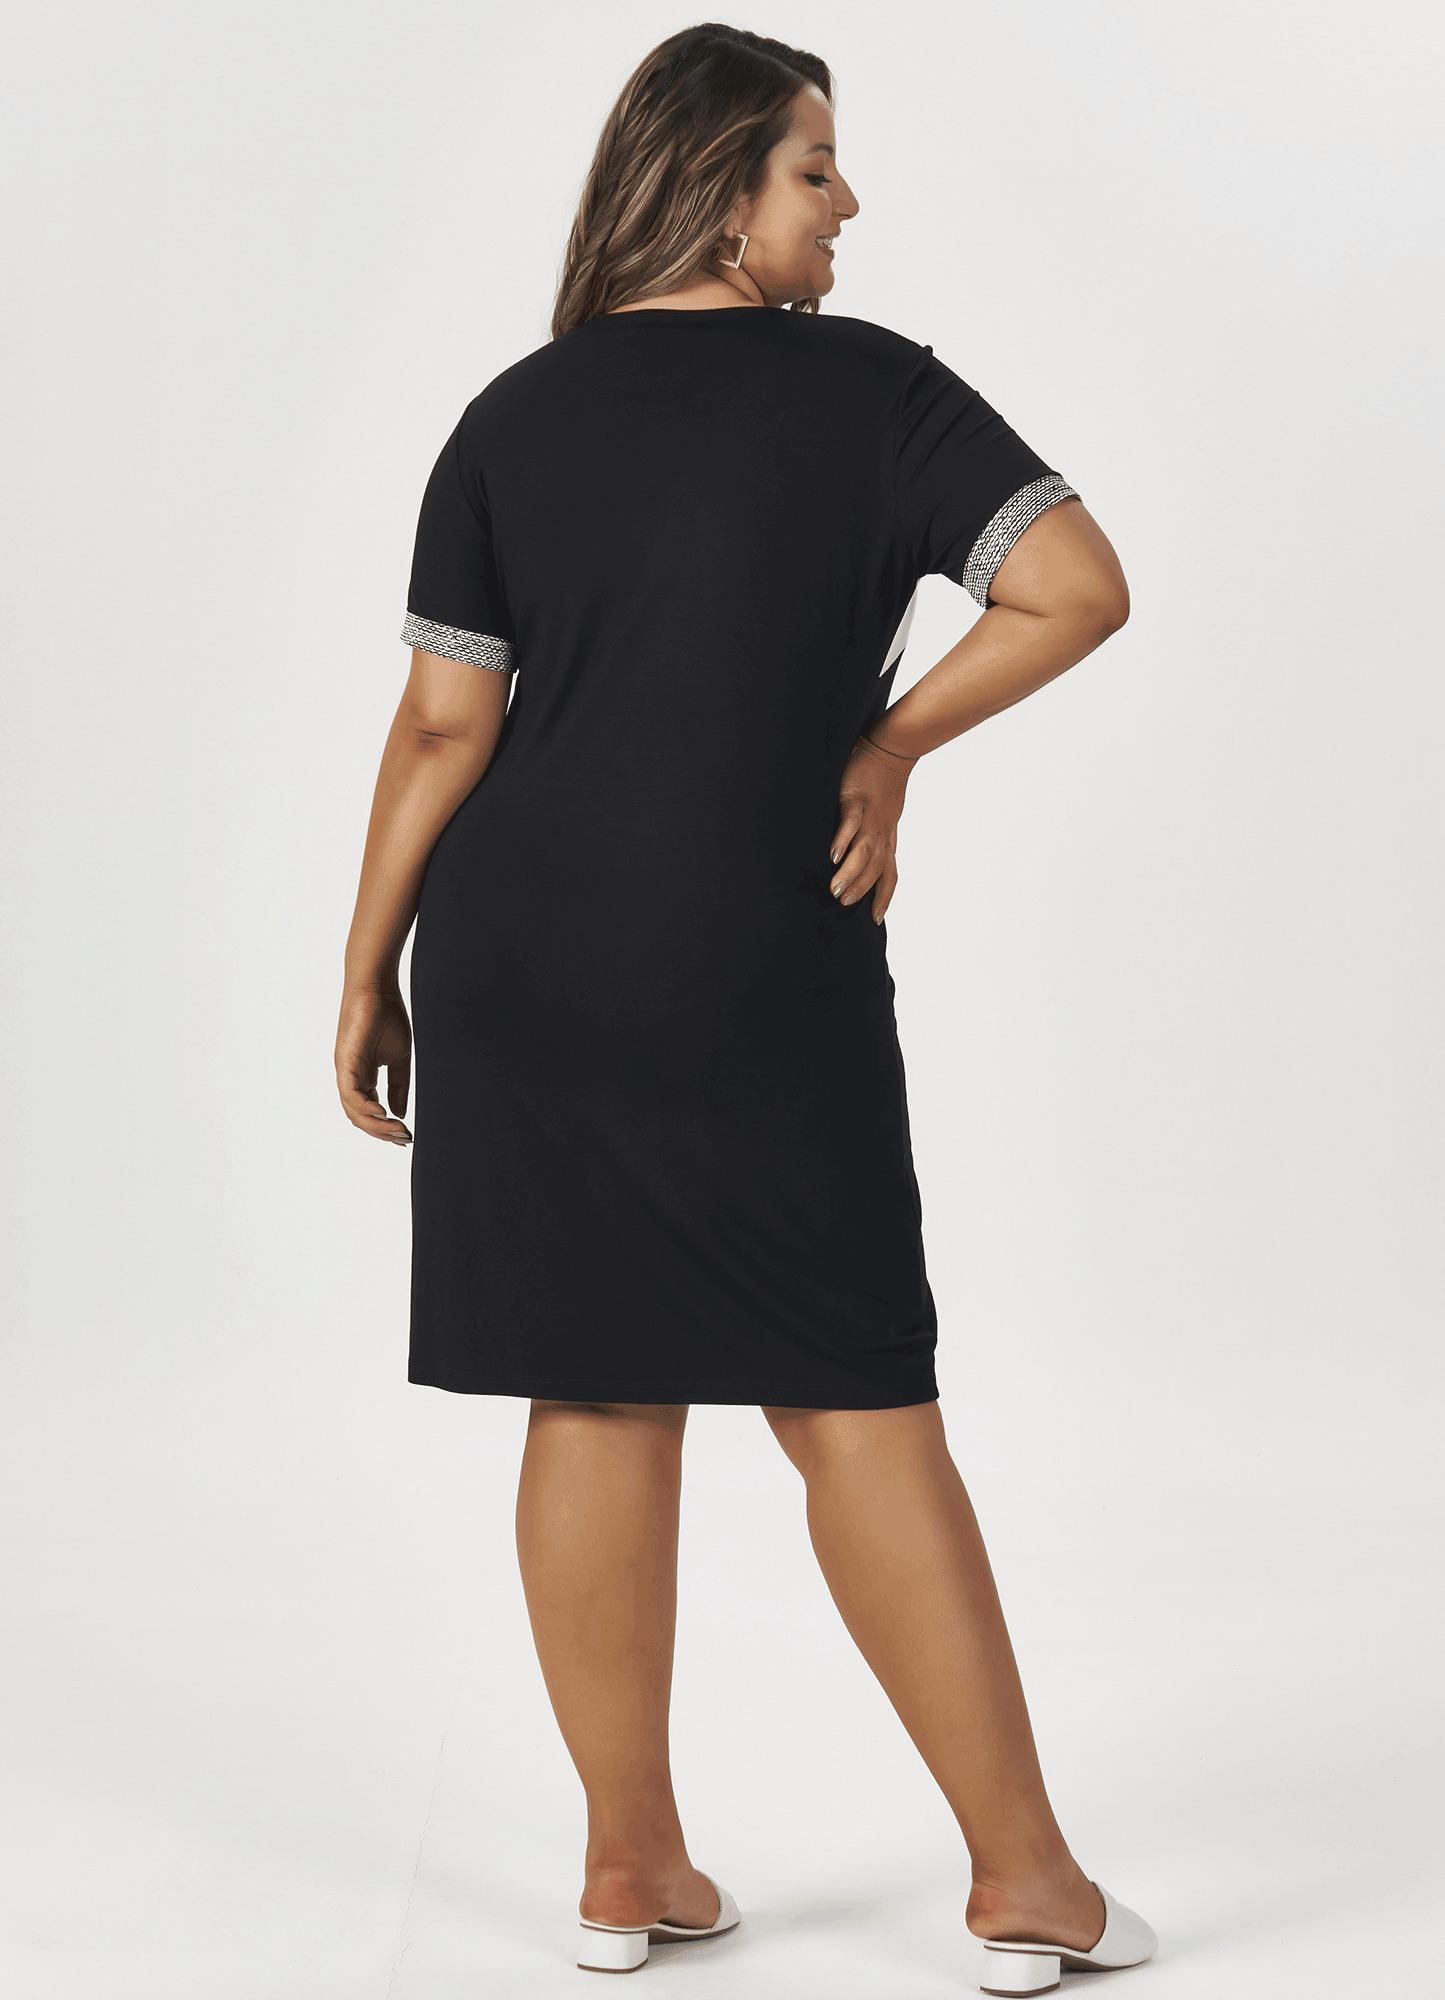 Vestido Feminino Malha Preto Recortes Estampados